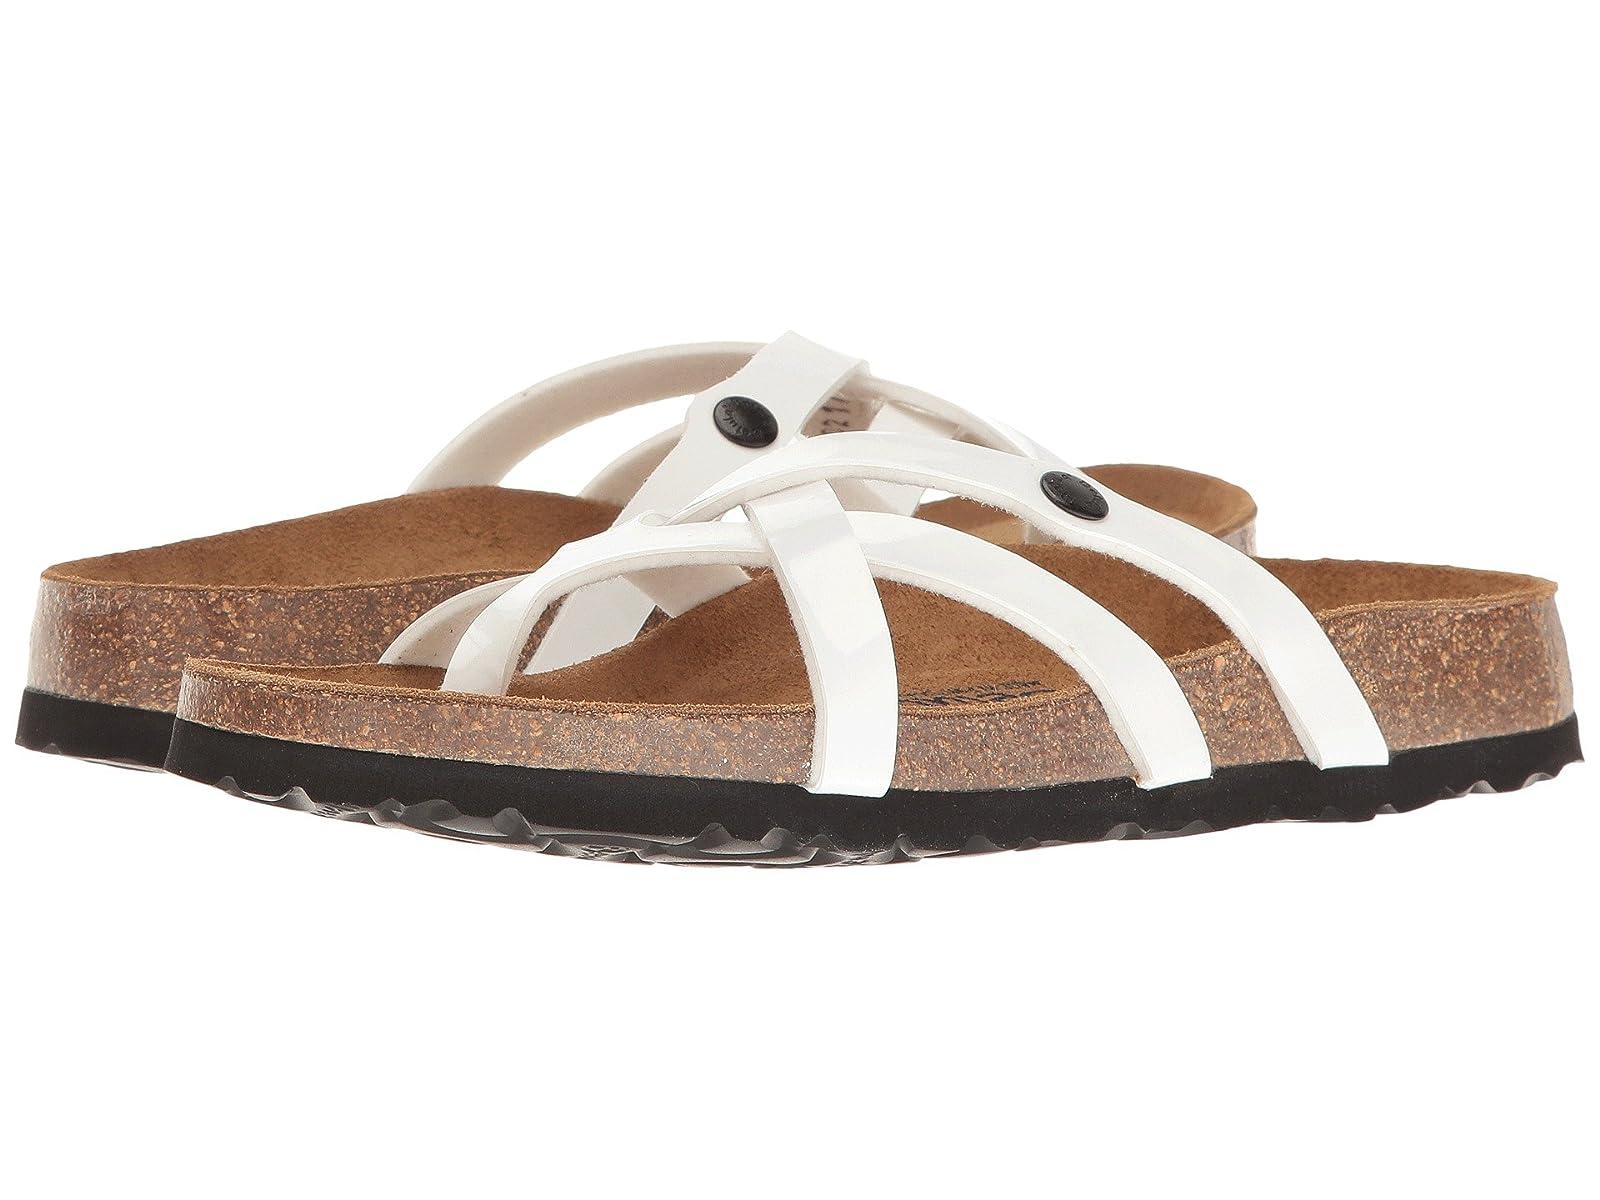 Betula Licensed by Birkenstock VinjaCheap and distinctive eye-catching shoes